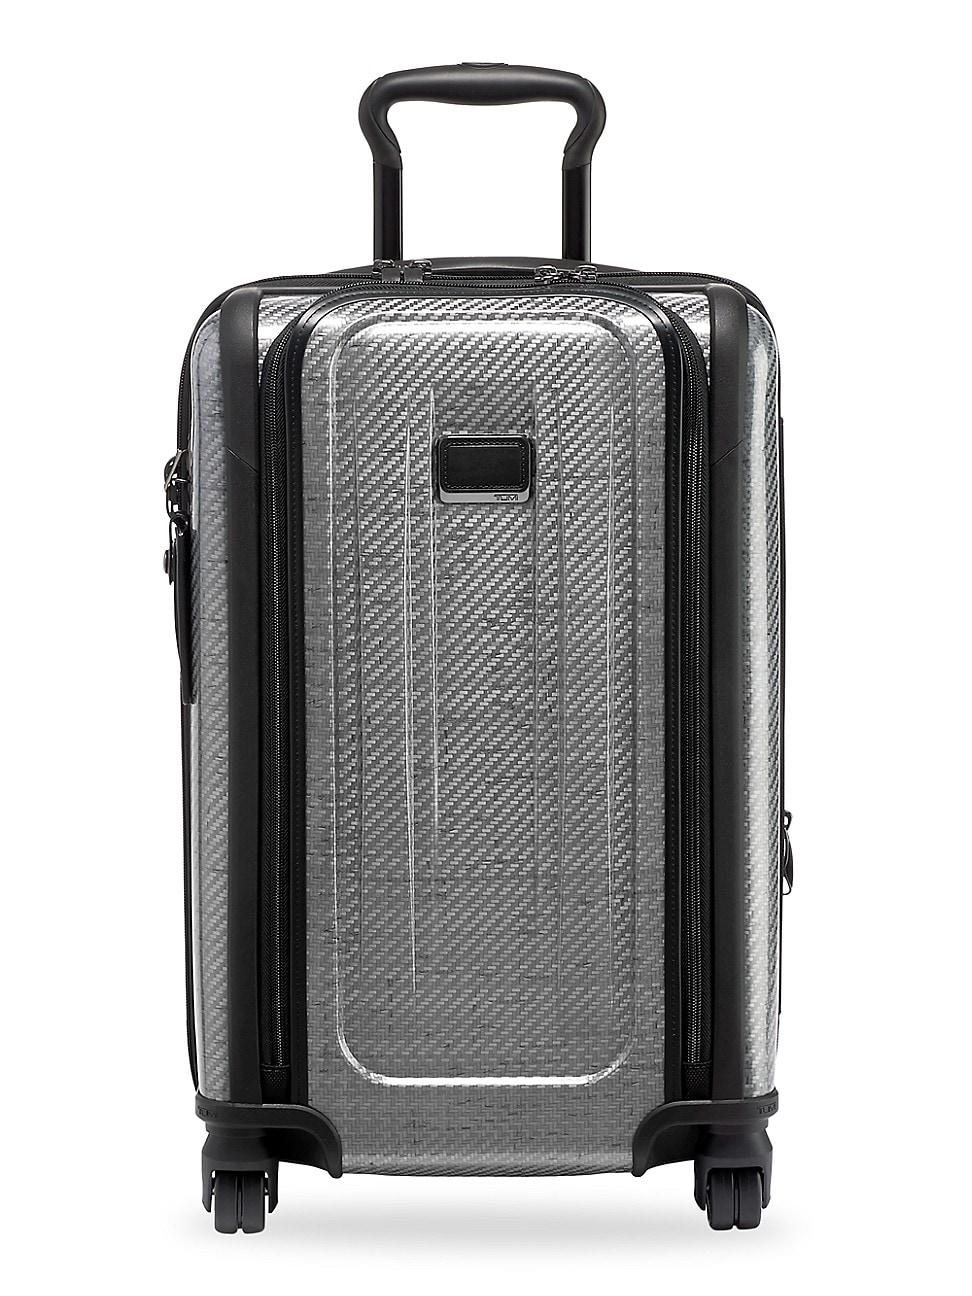 Tumi Tera Lite Max International Suitcase In Graphite